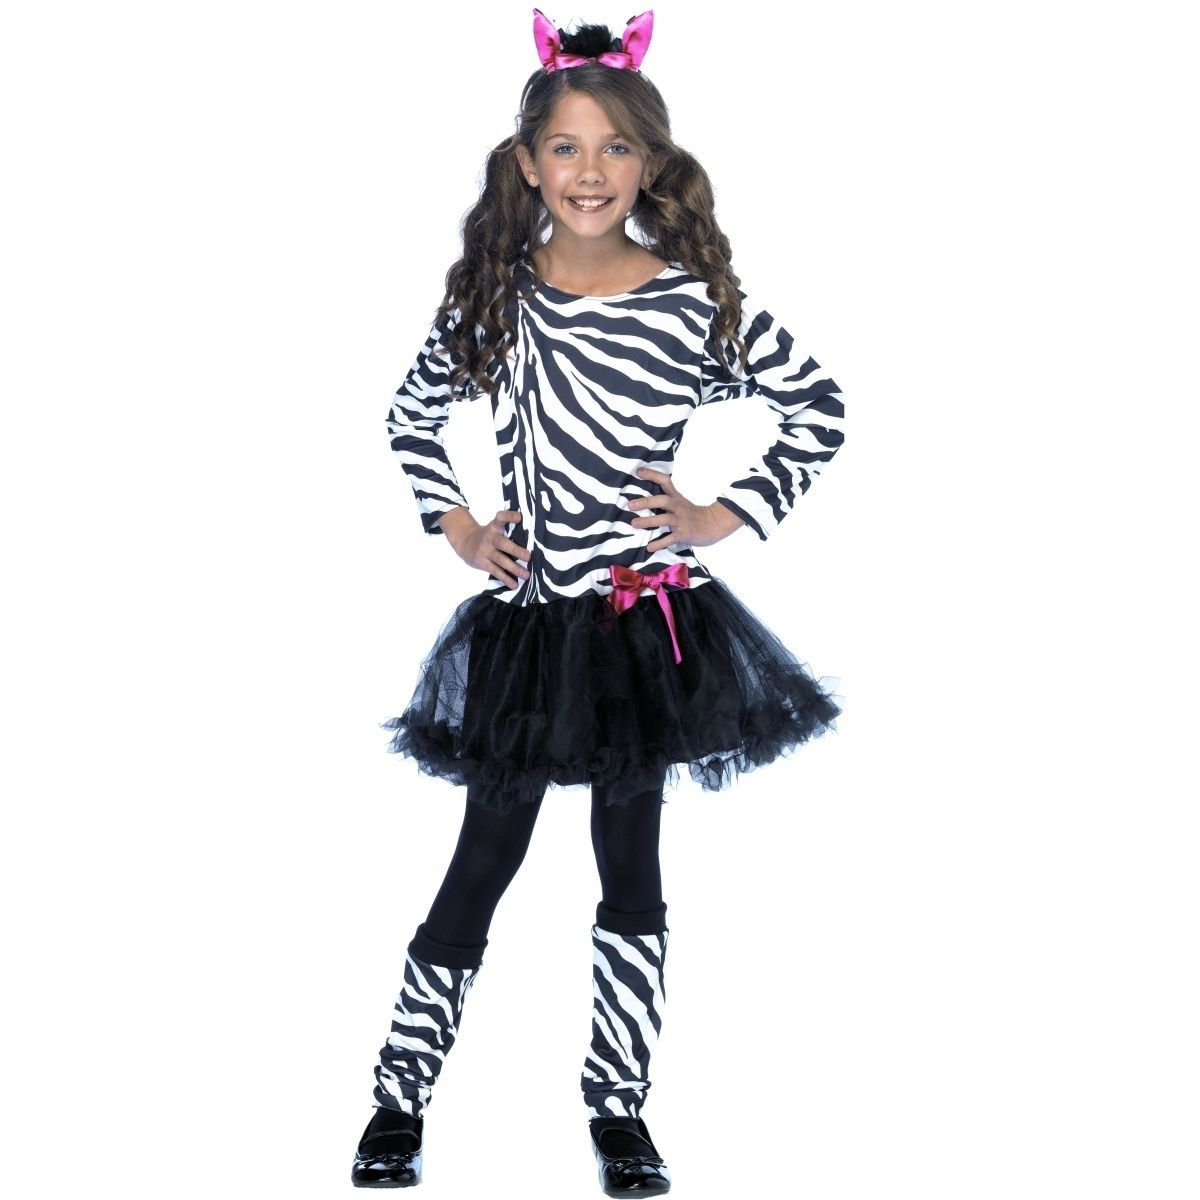 Костюм зебры для девочки своими руками